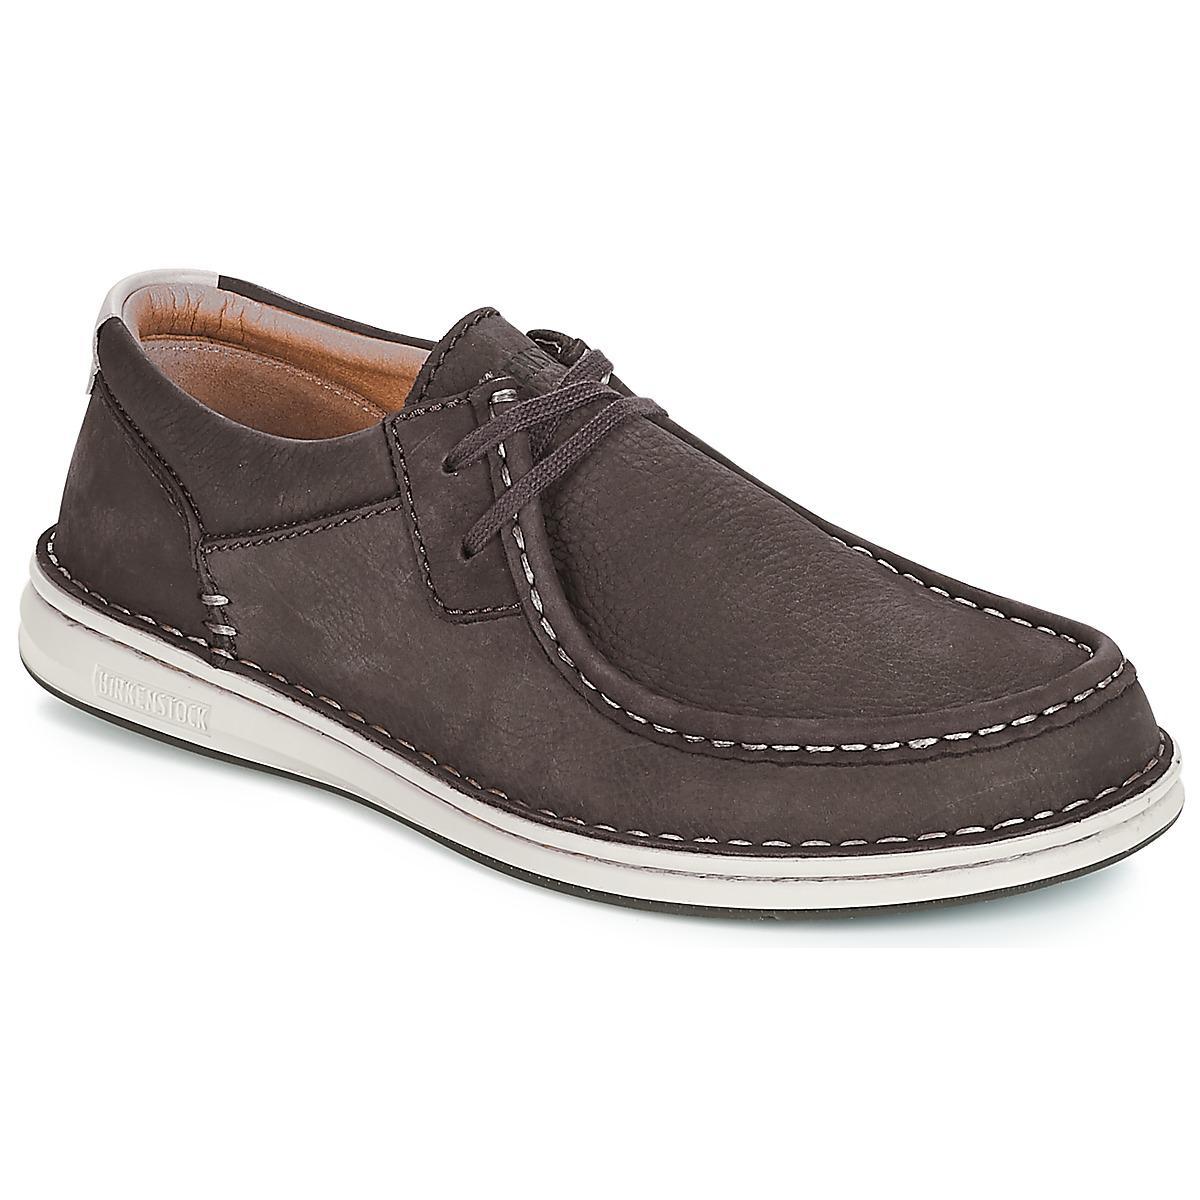 00dda9a730c Birkenstock Pasadena Men's Boat Shoes In Brown for Men - Lyst